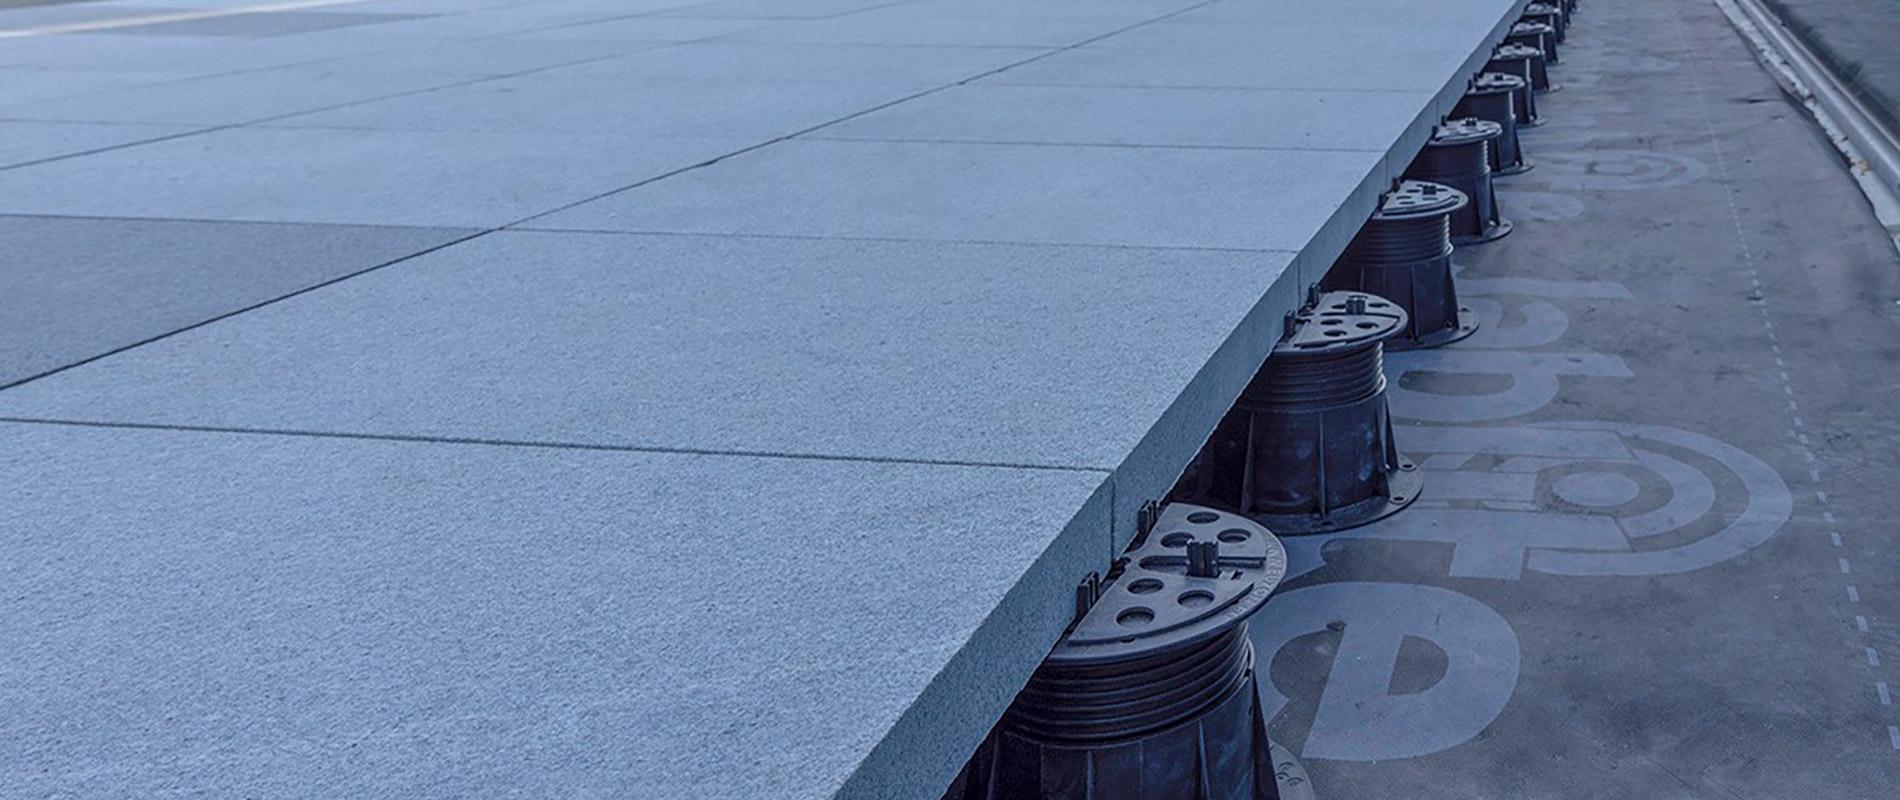 do-paving-pedestals-need-adjustment-over-time